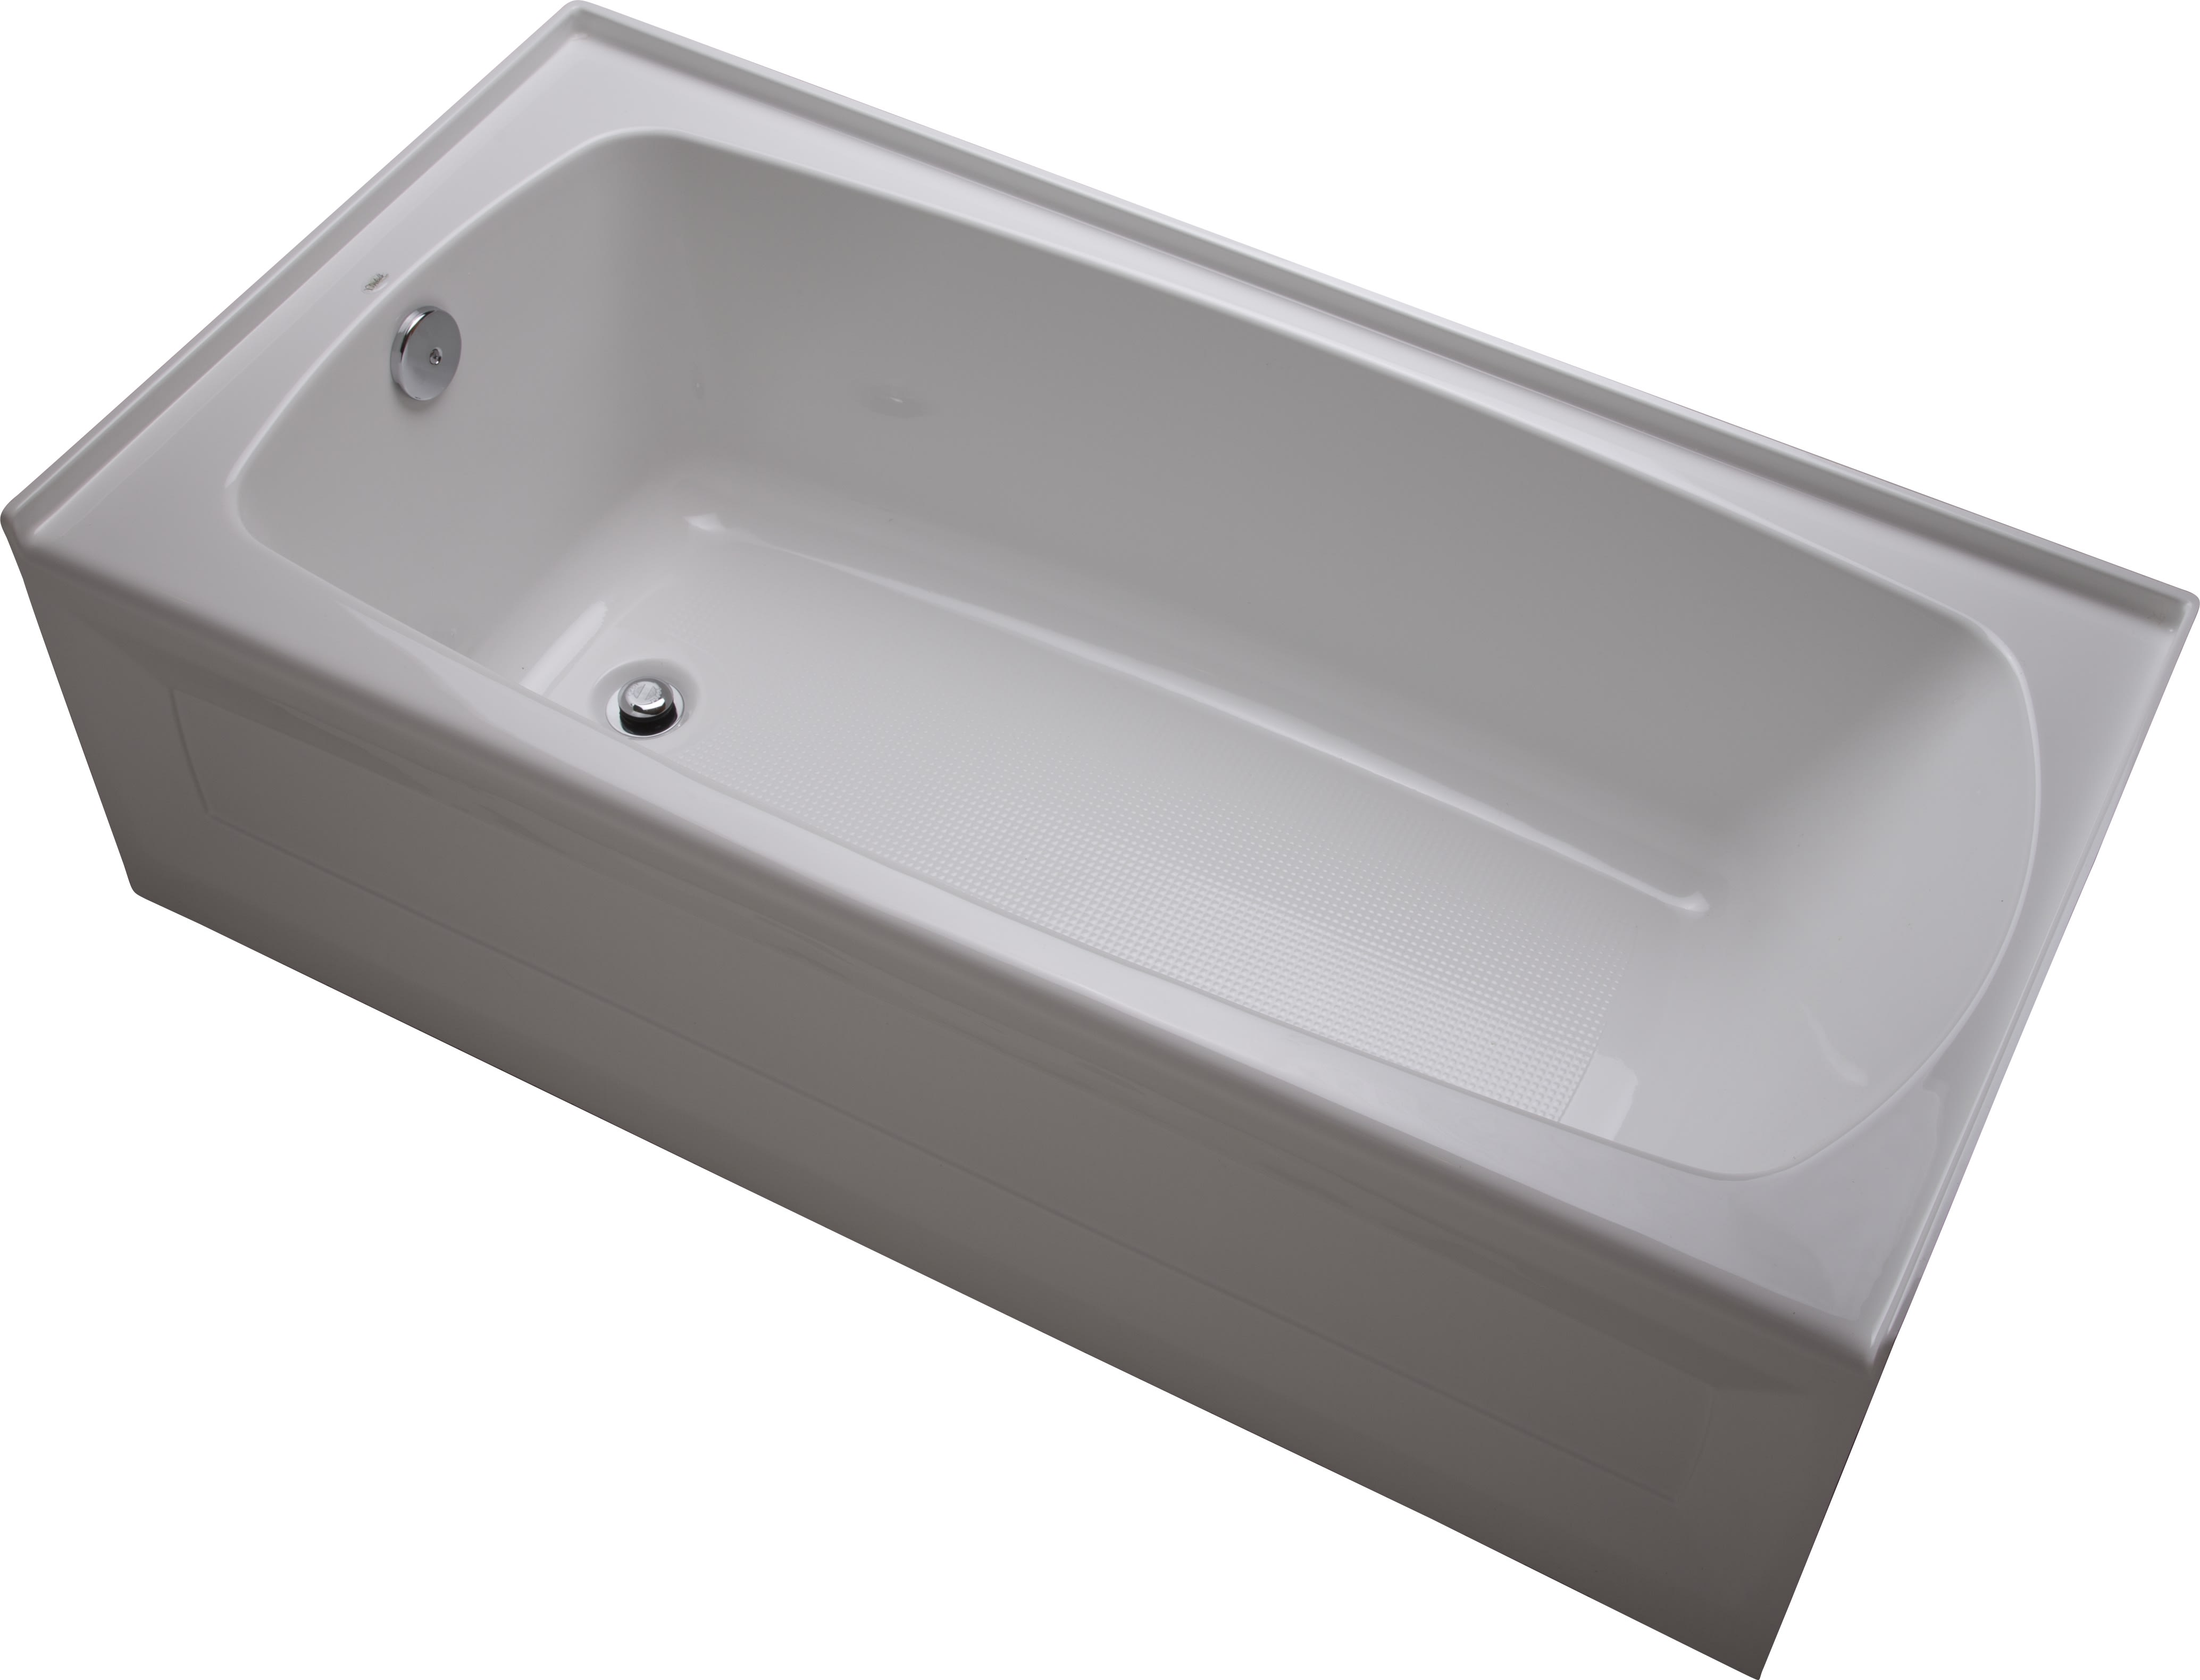 oval aarhus free product today overstock garden shipping freestanding home x bathtub